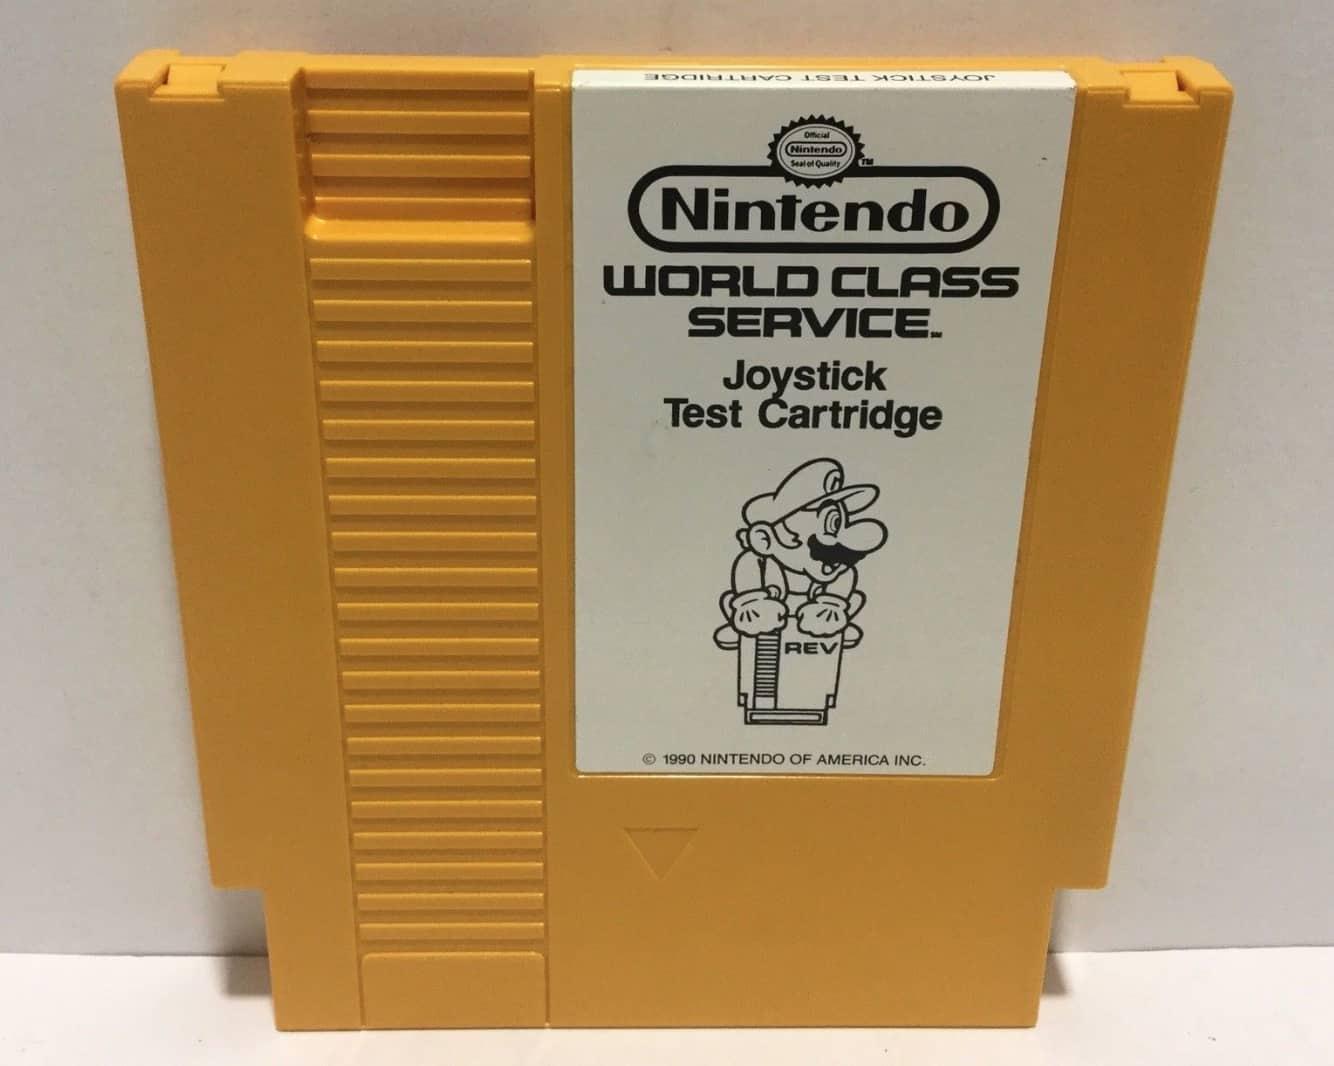 a picture of a NES joystick test cartridge